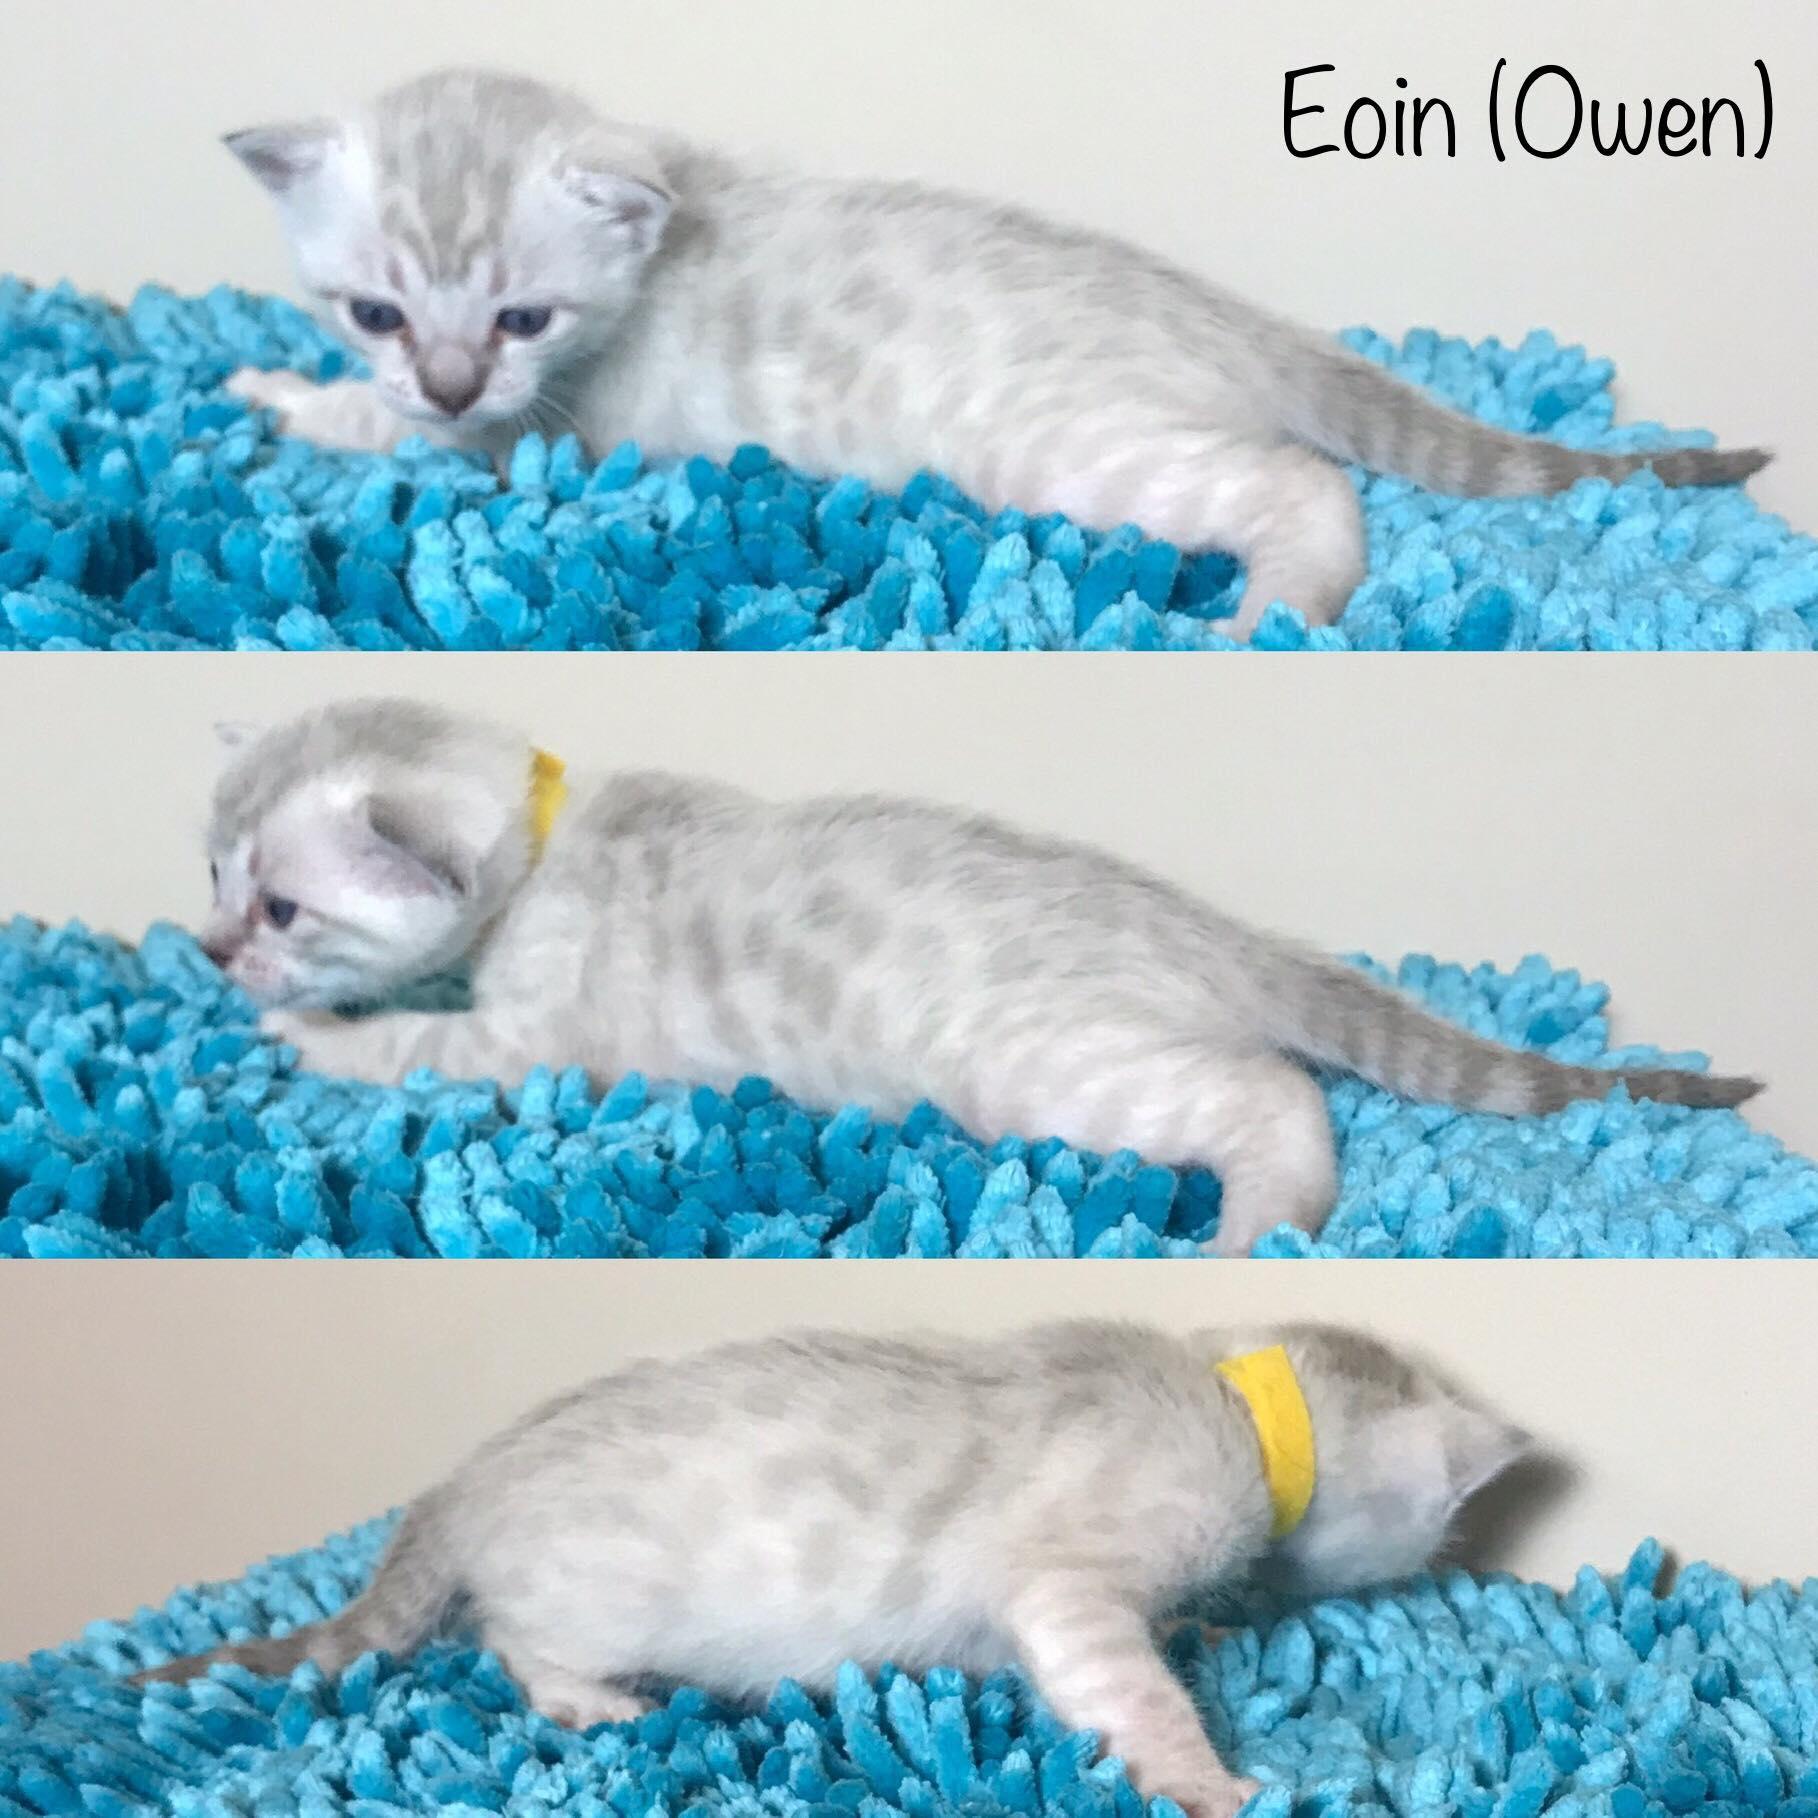 Eoin 3 weeks